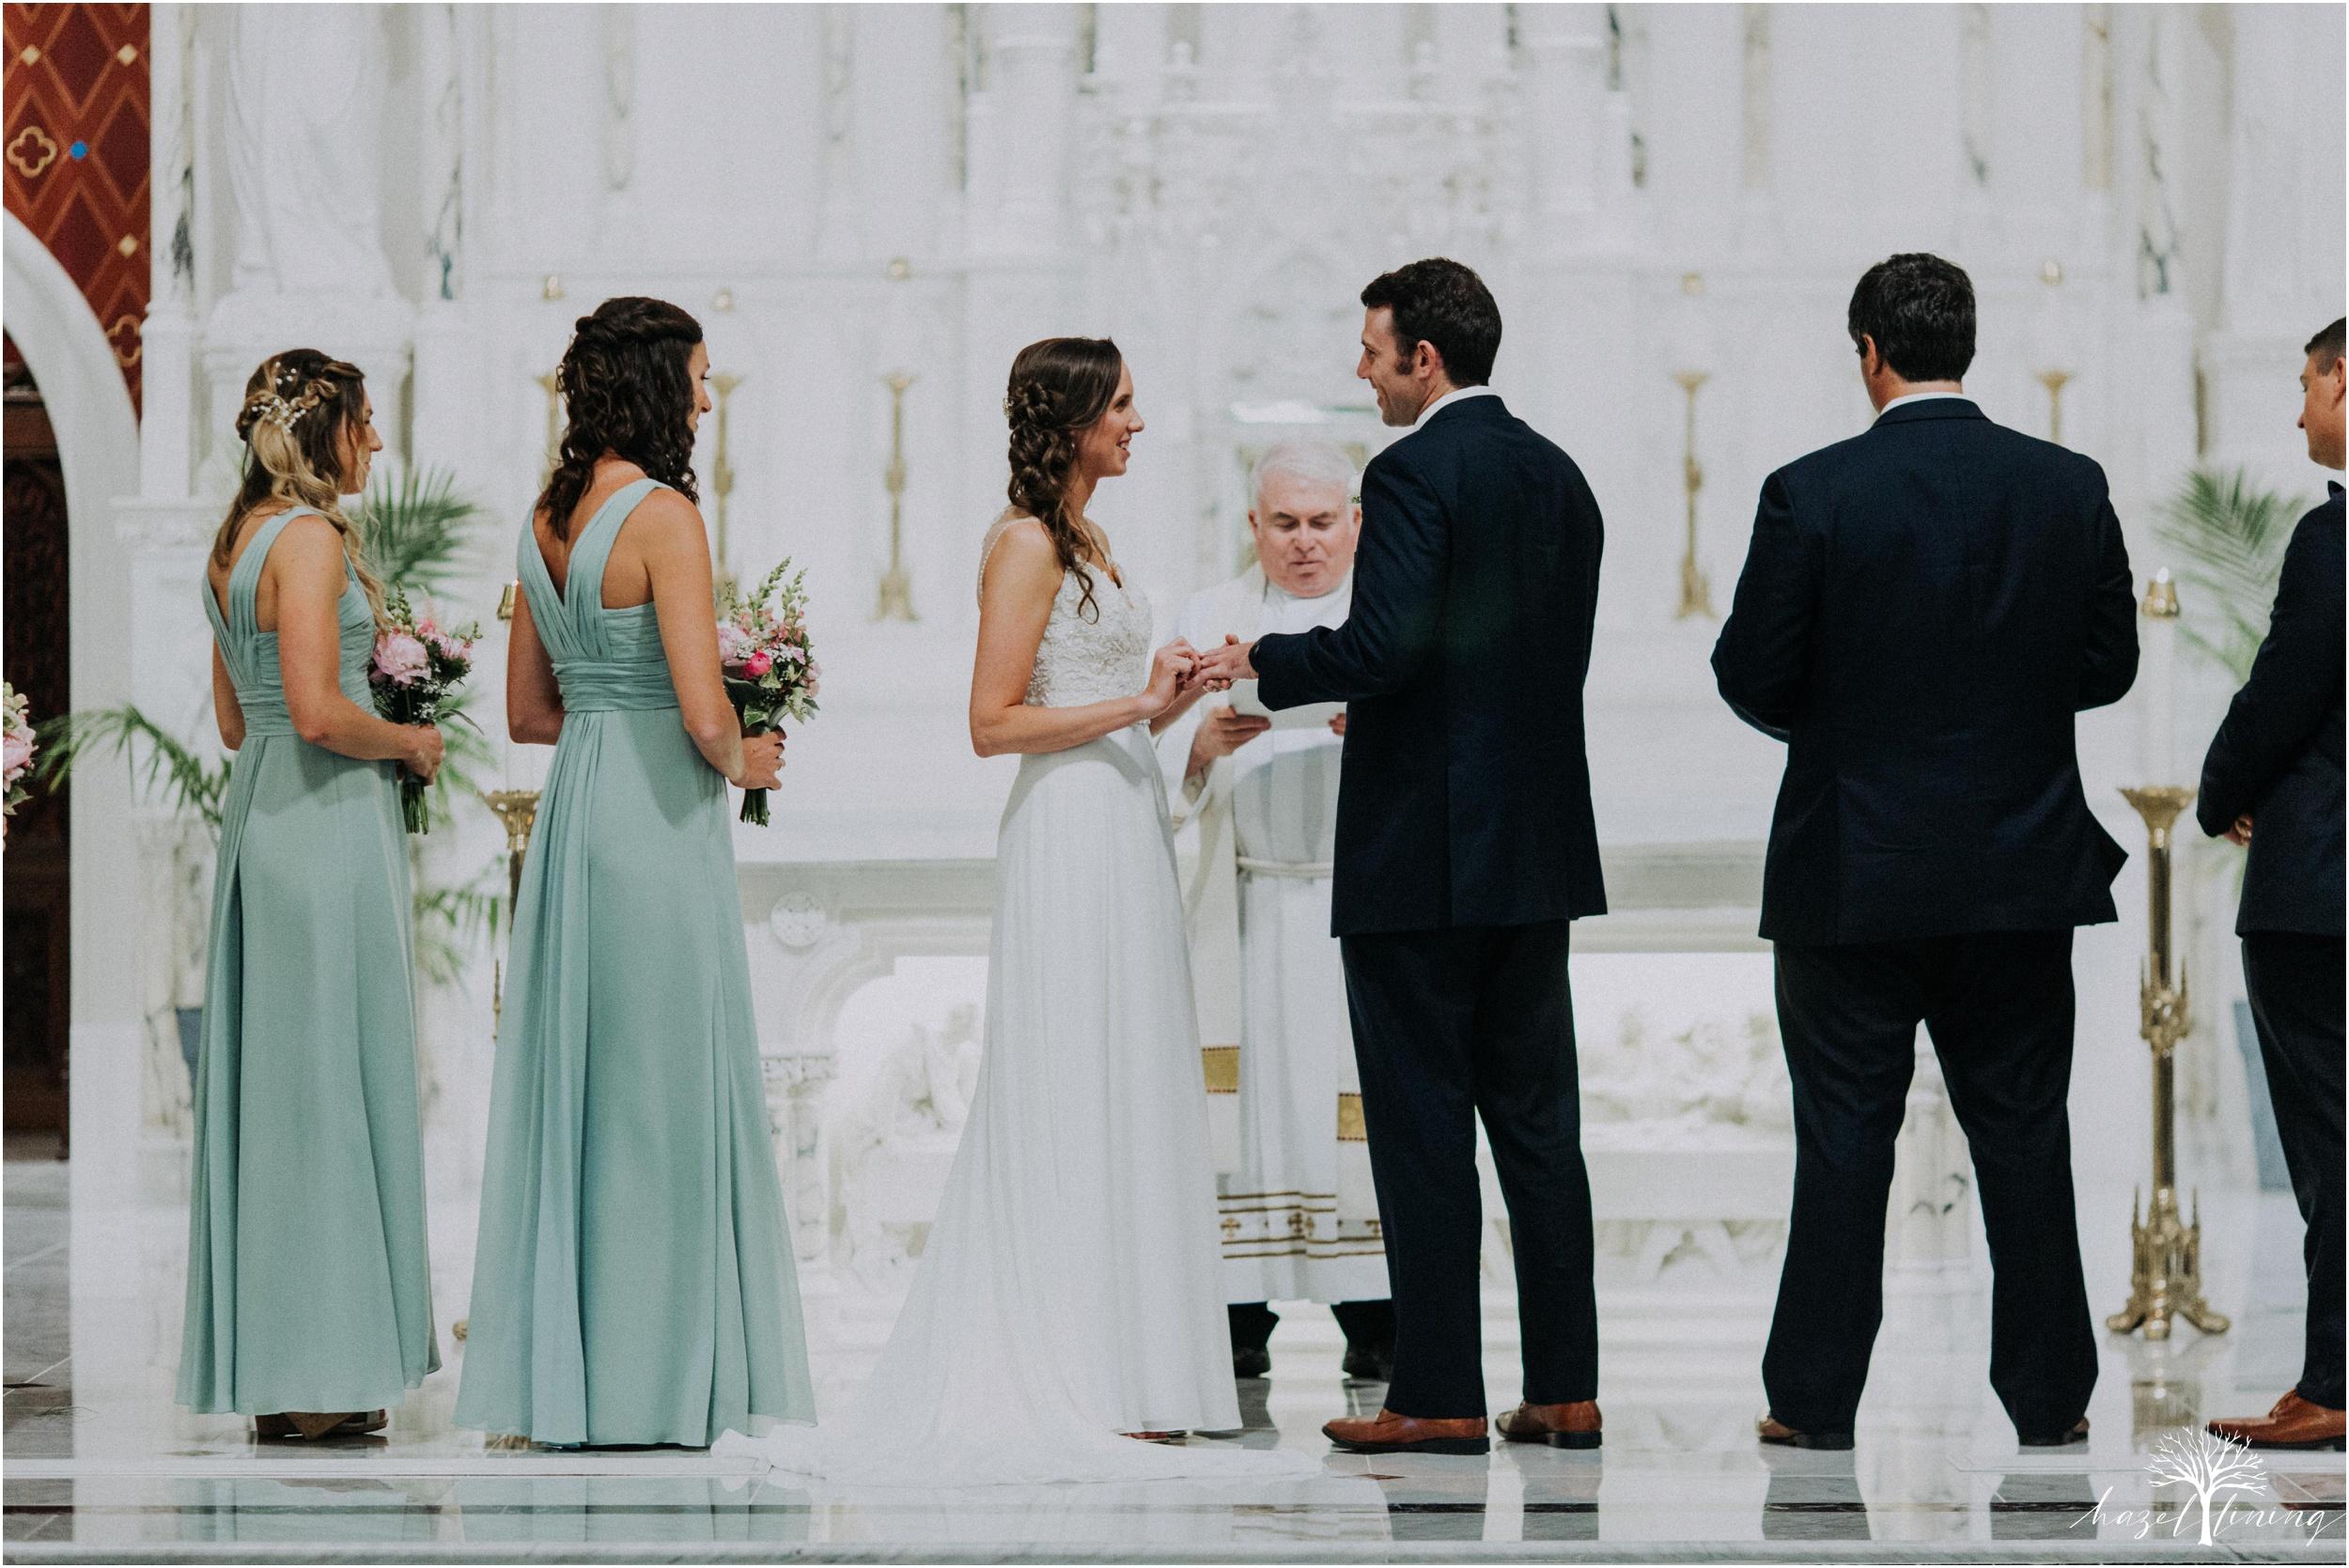 hazel-lining-travel-wedding-elopement-photography_0060.jpg